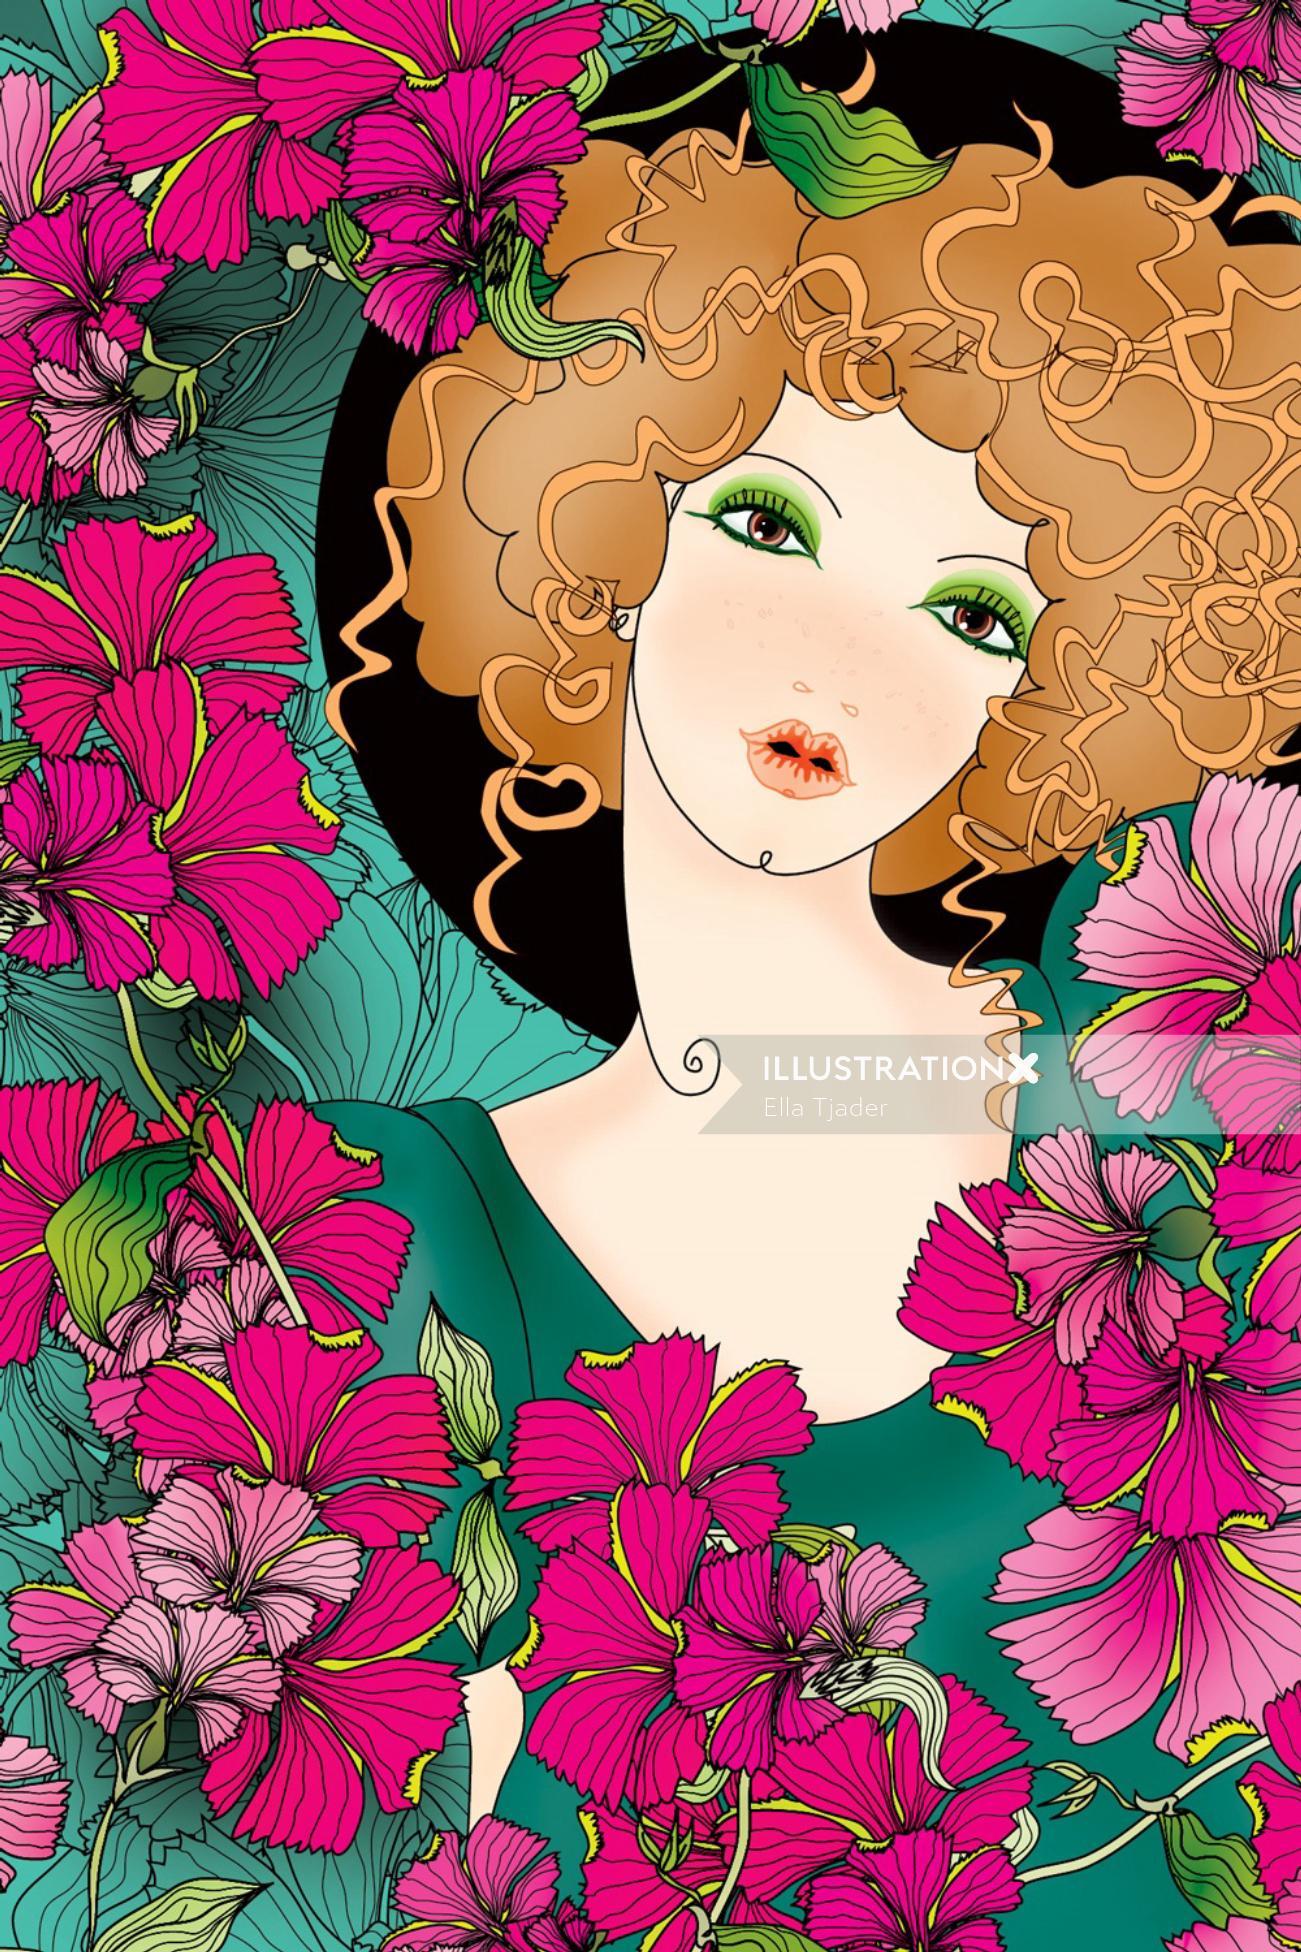 Illustration of a female